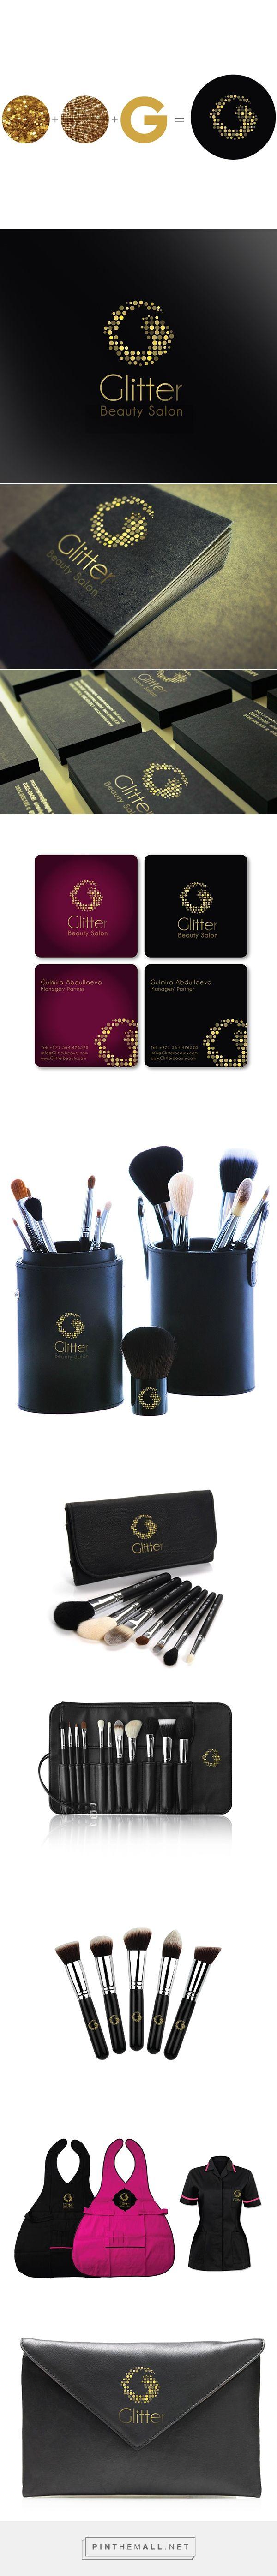 Glitter Beauty Salon Branding on Behance | Fivestar Branding – Design and Branding Agency & Inspiration Gallery | Professional Logo and Website Design